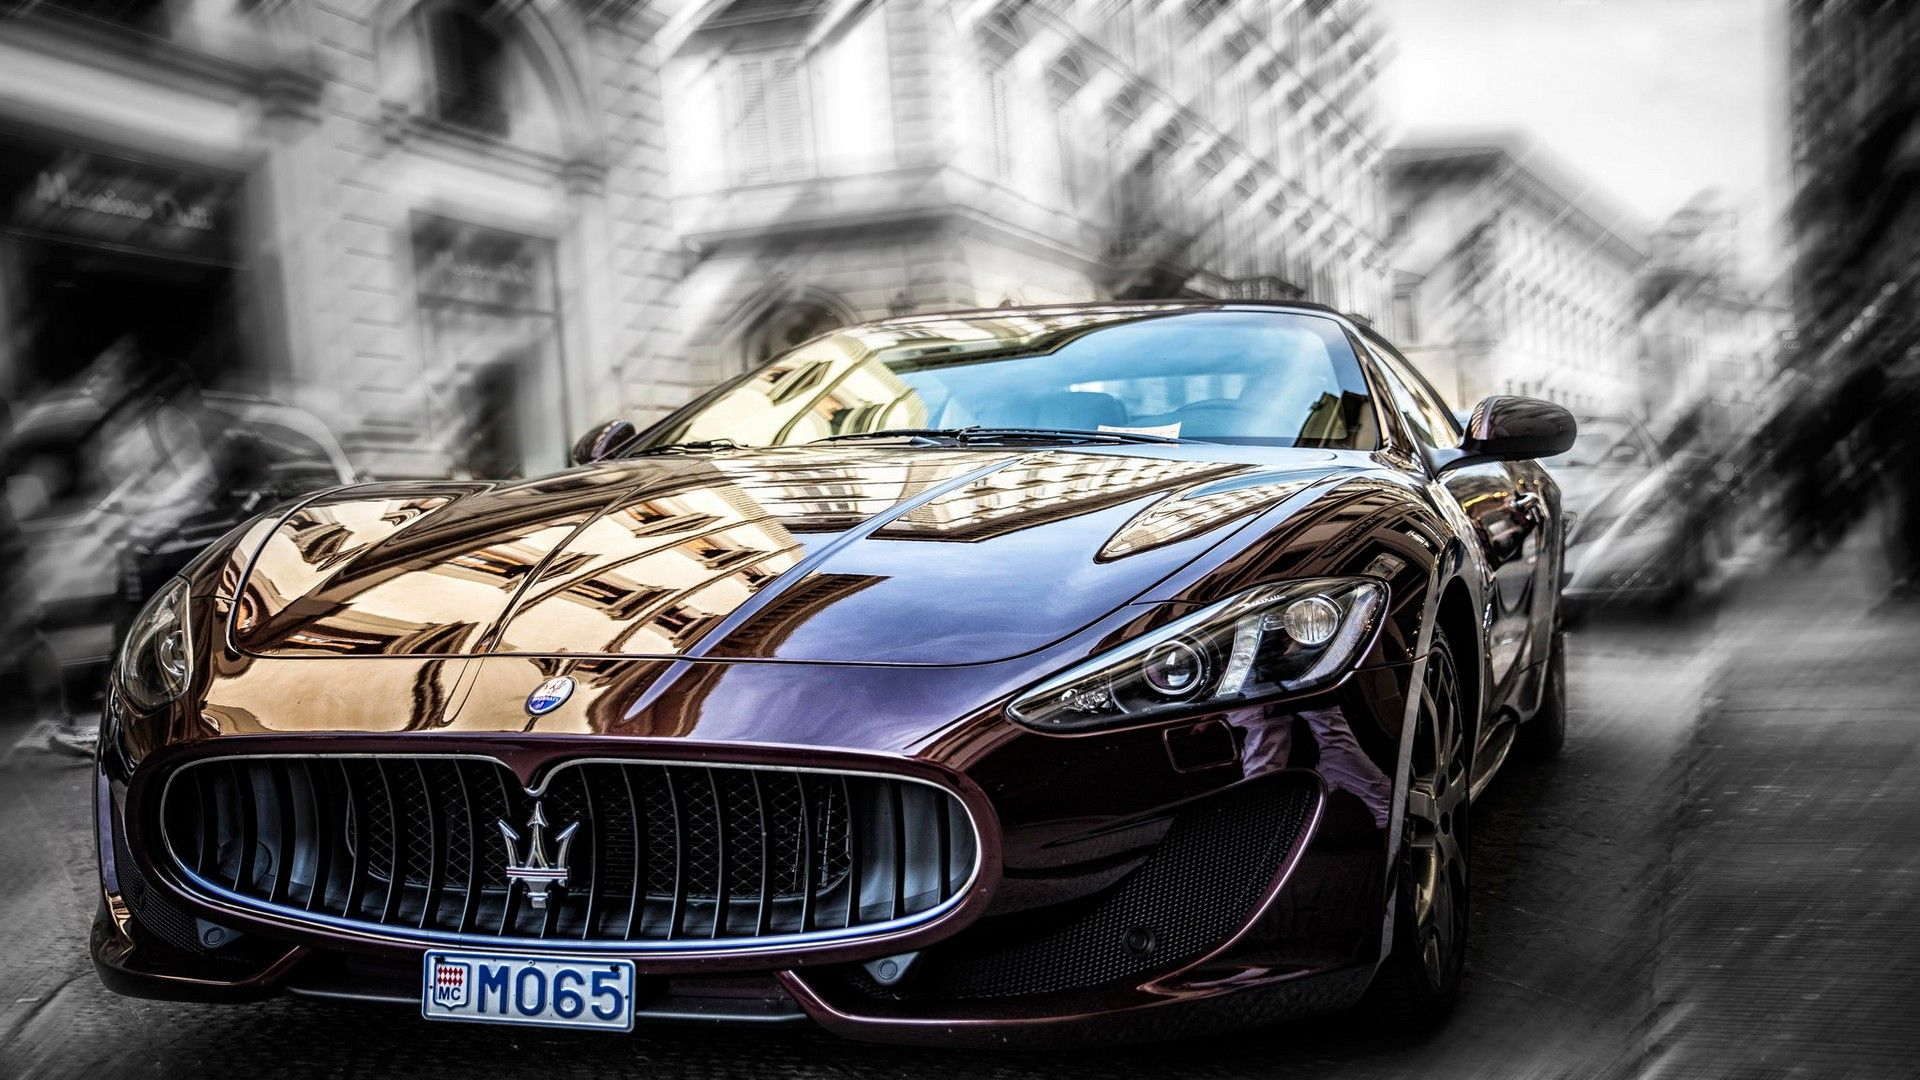 Asus gaming desktops amp monitors brochures from cee show 2016 singapore - Maserati Quattroporte 4 High Resolution Car Wallpaper Maserati Granturismo S Mc Line Bw Cars Hd